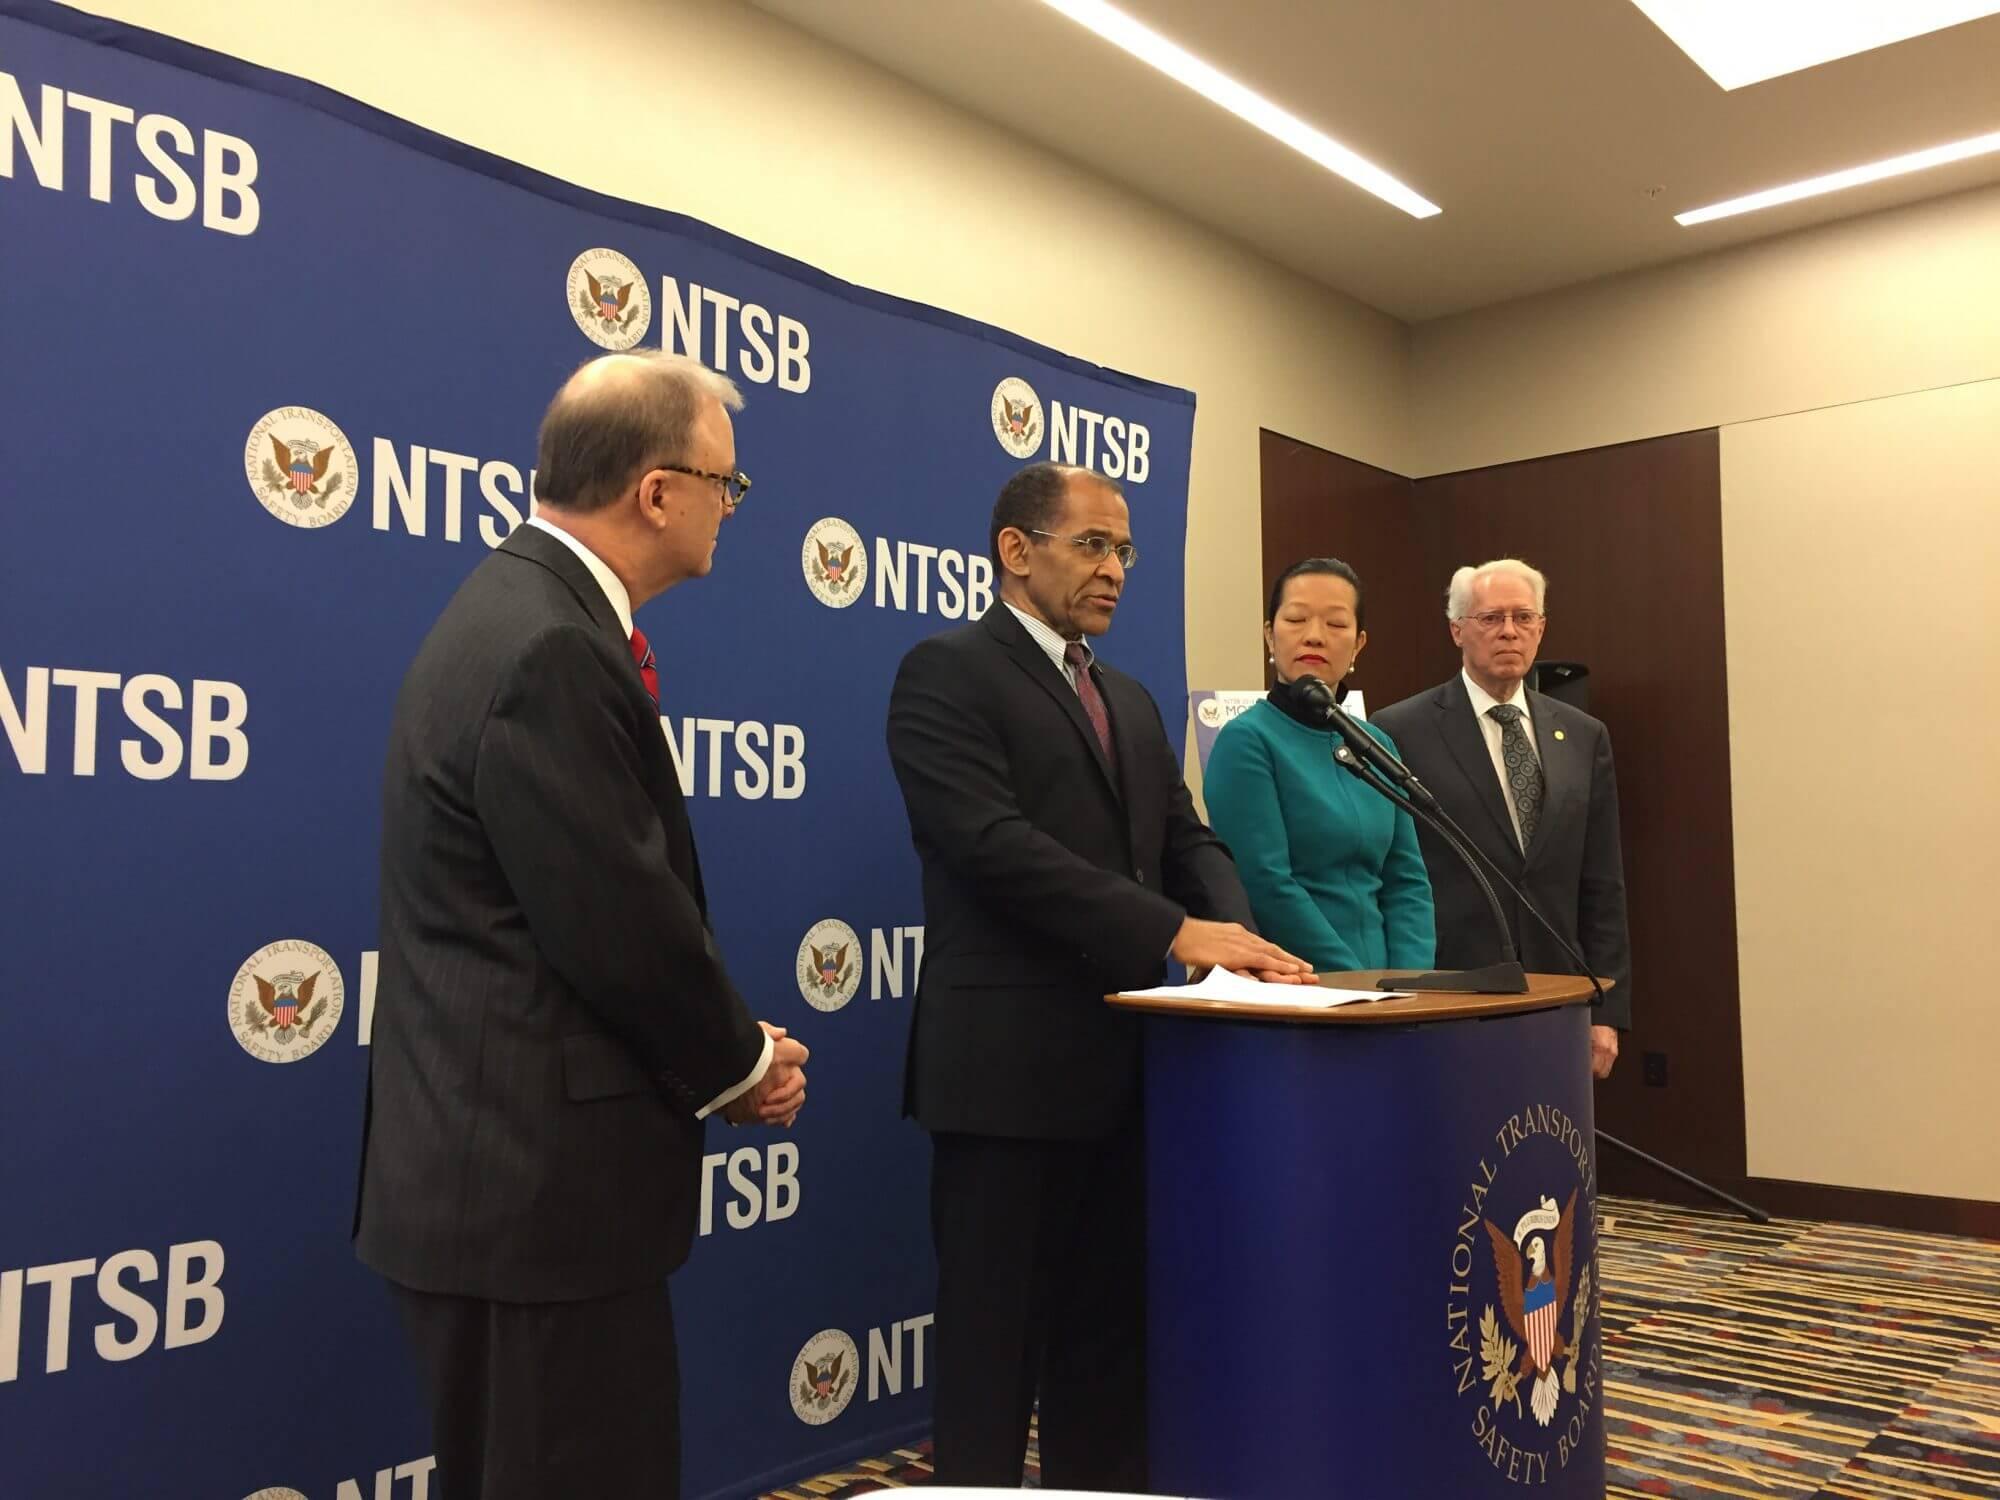 Safer railroad system tops National Transportation Safety Board's 2016 wish list